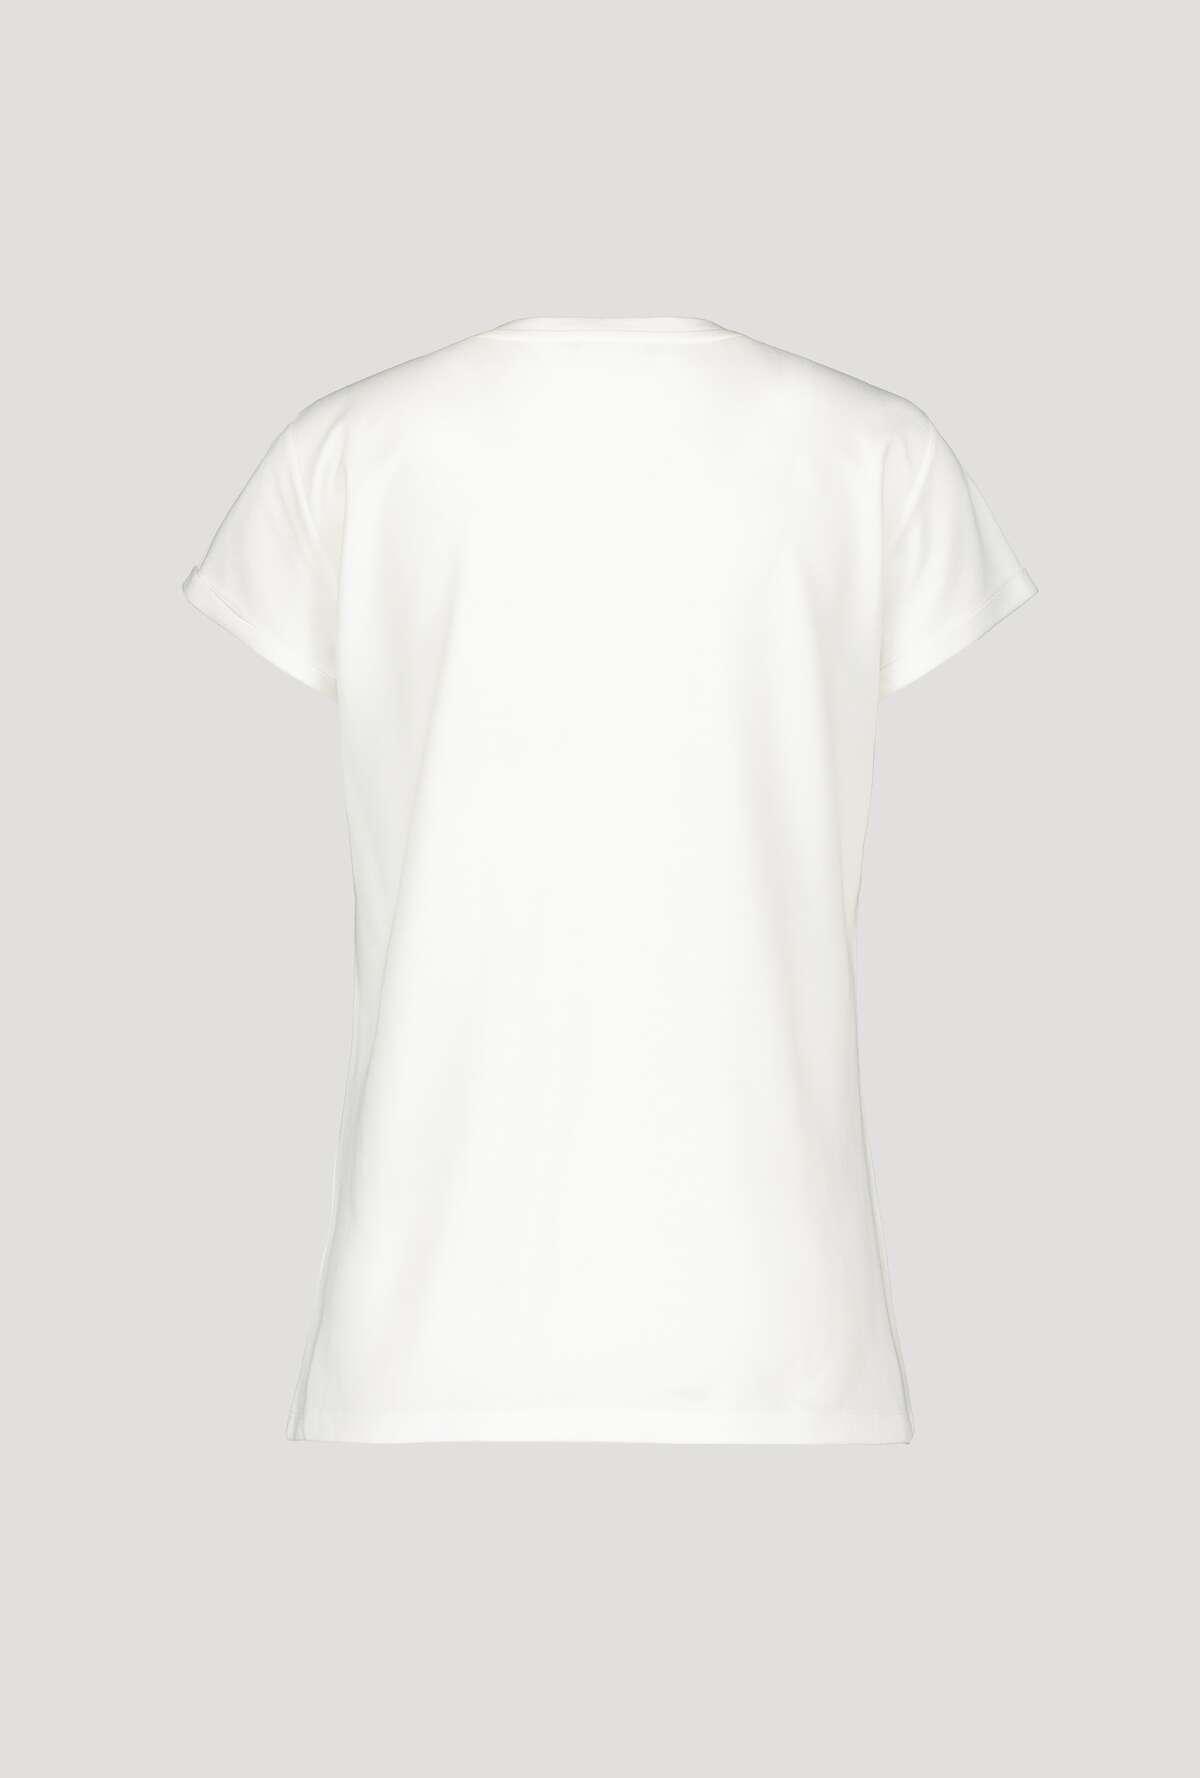 Monari Shirt Follow